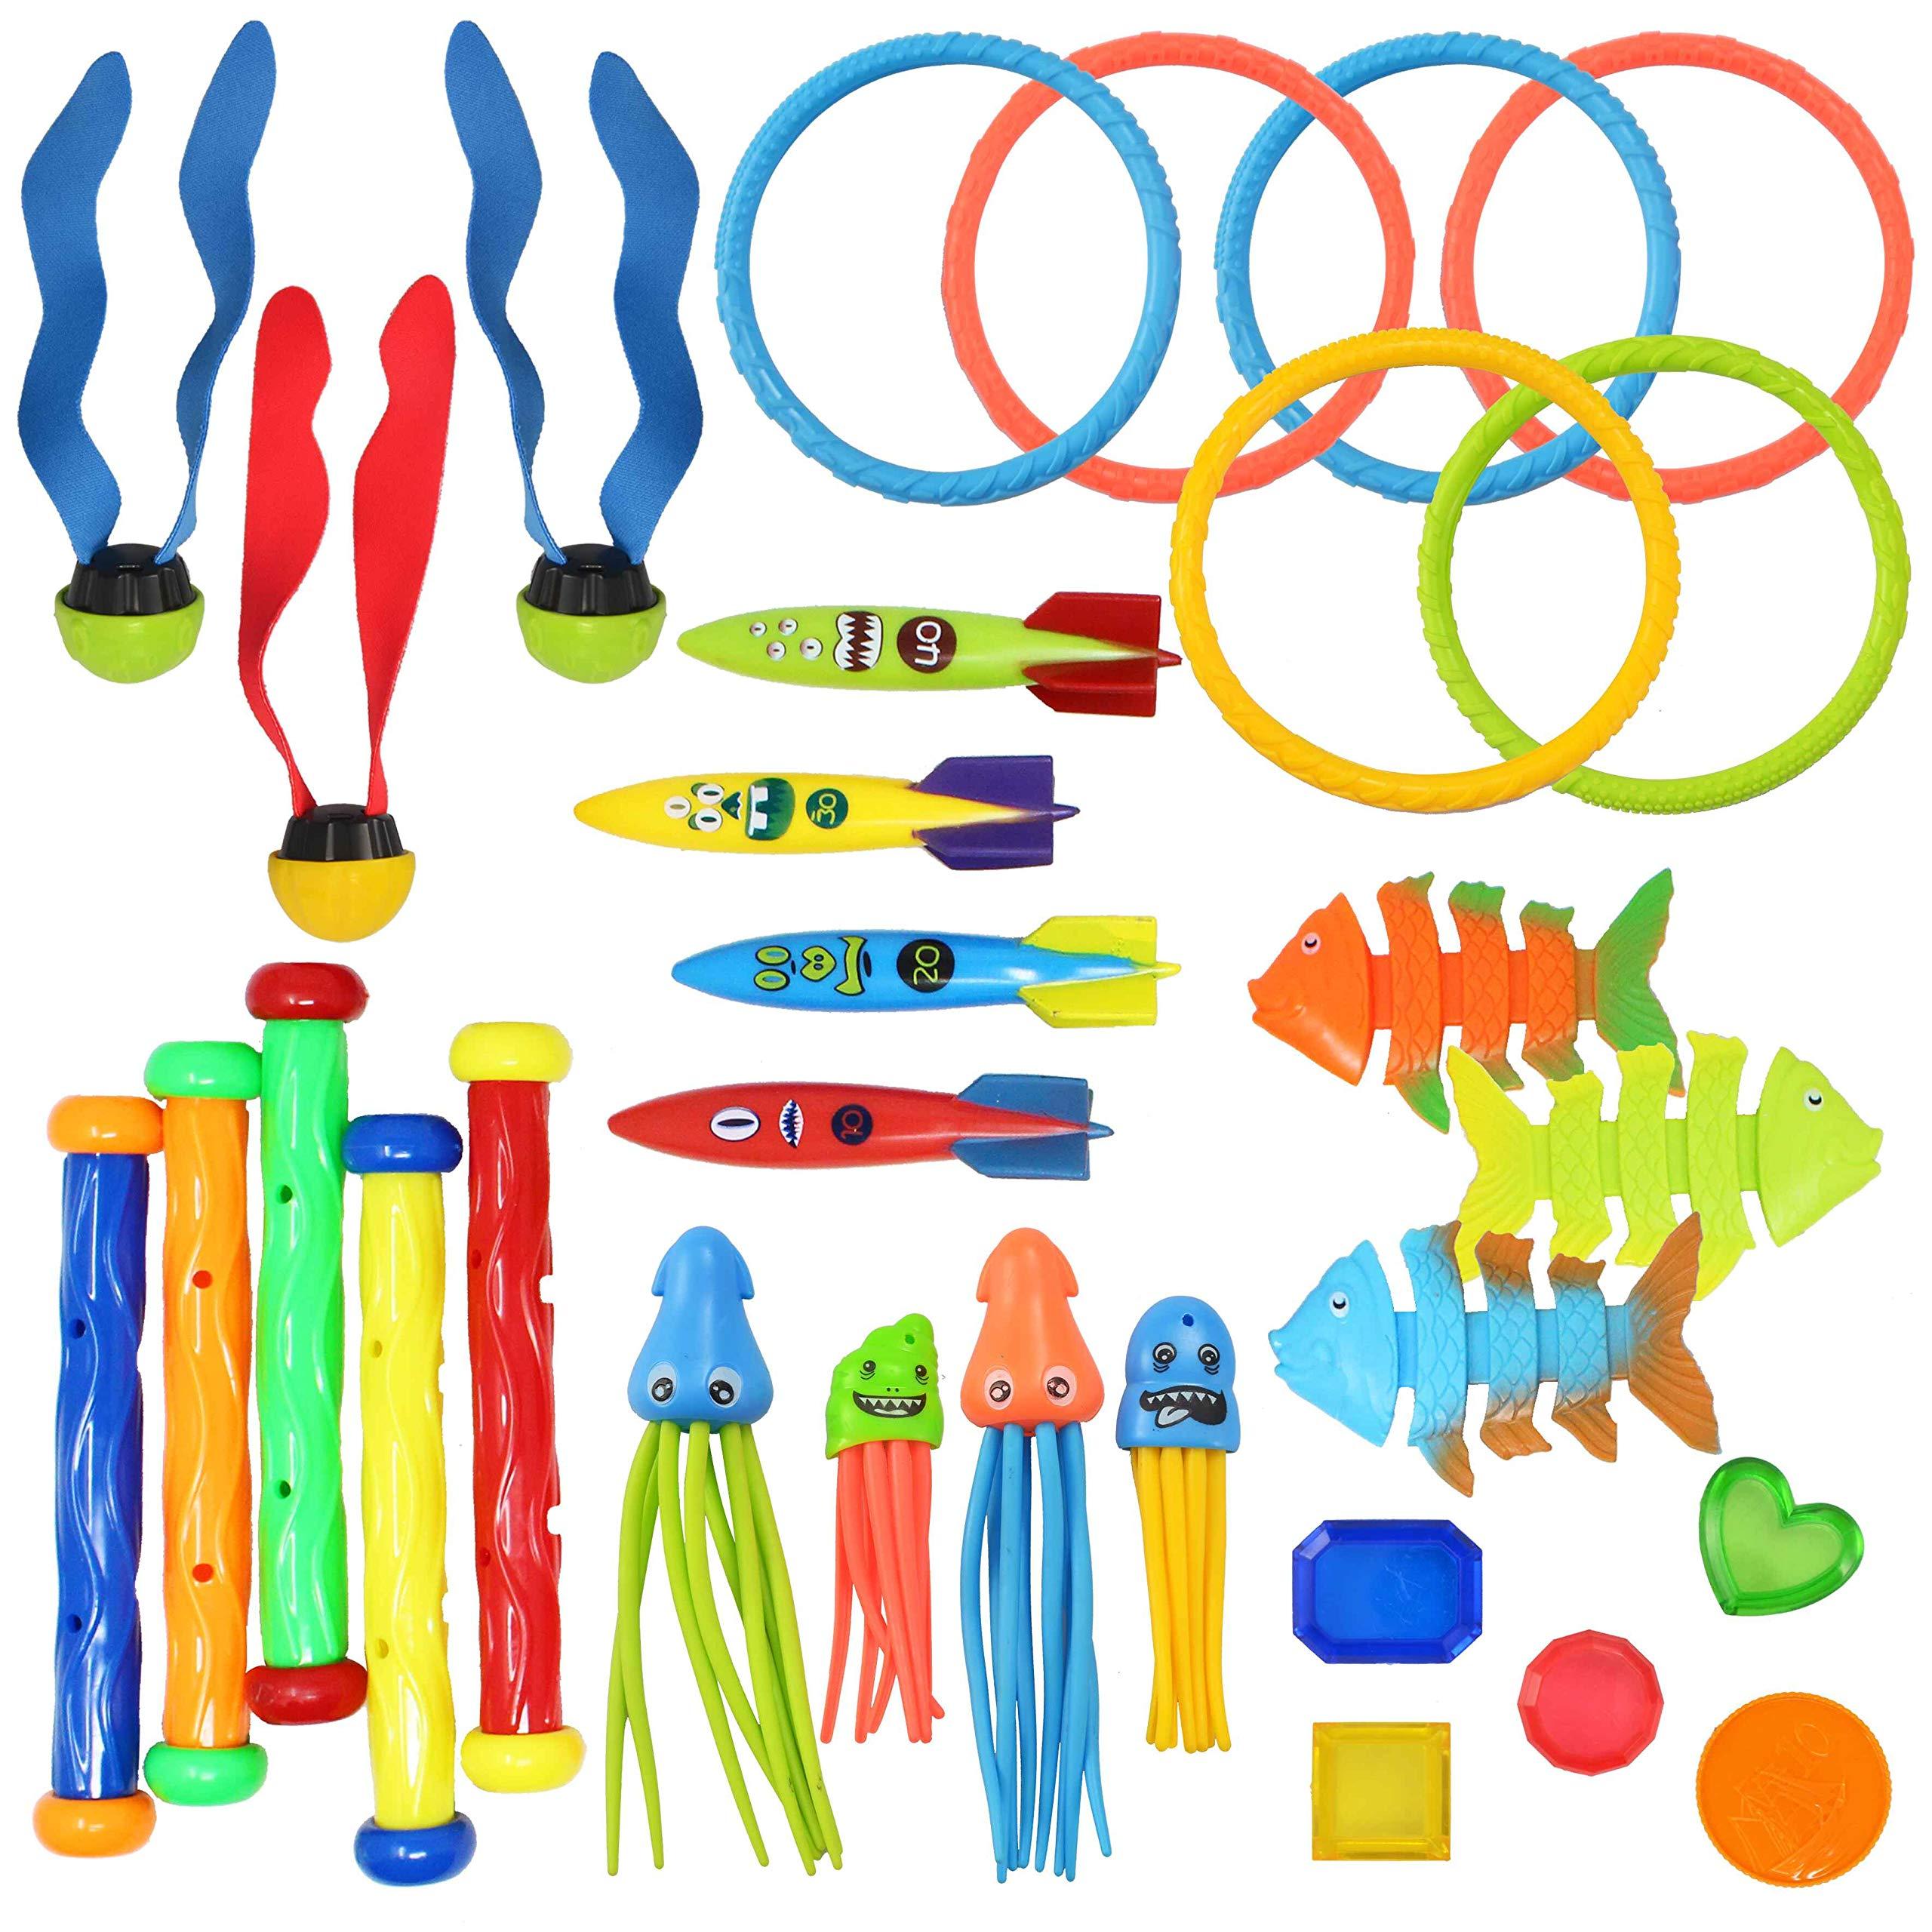 JOYIN 30 Pcs Diving Pool Toys Jumbo Set Includes (5) Diving Sticks, (6) Diving Rings, (5) Pirate Treasures, (4) Toypedo Bandits, (3) Diving Toy Balls, (3) Fish Toys, (4) Stringy Octopus by JOYIN